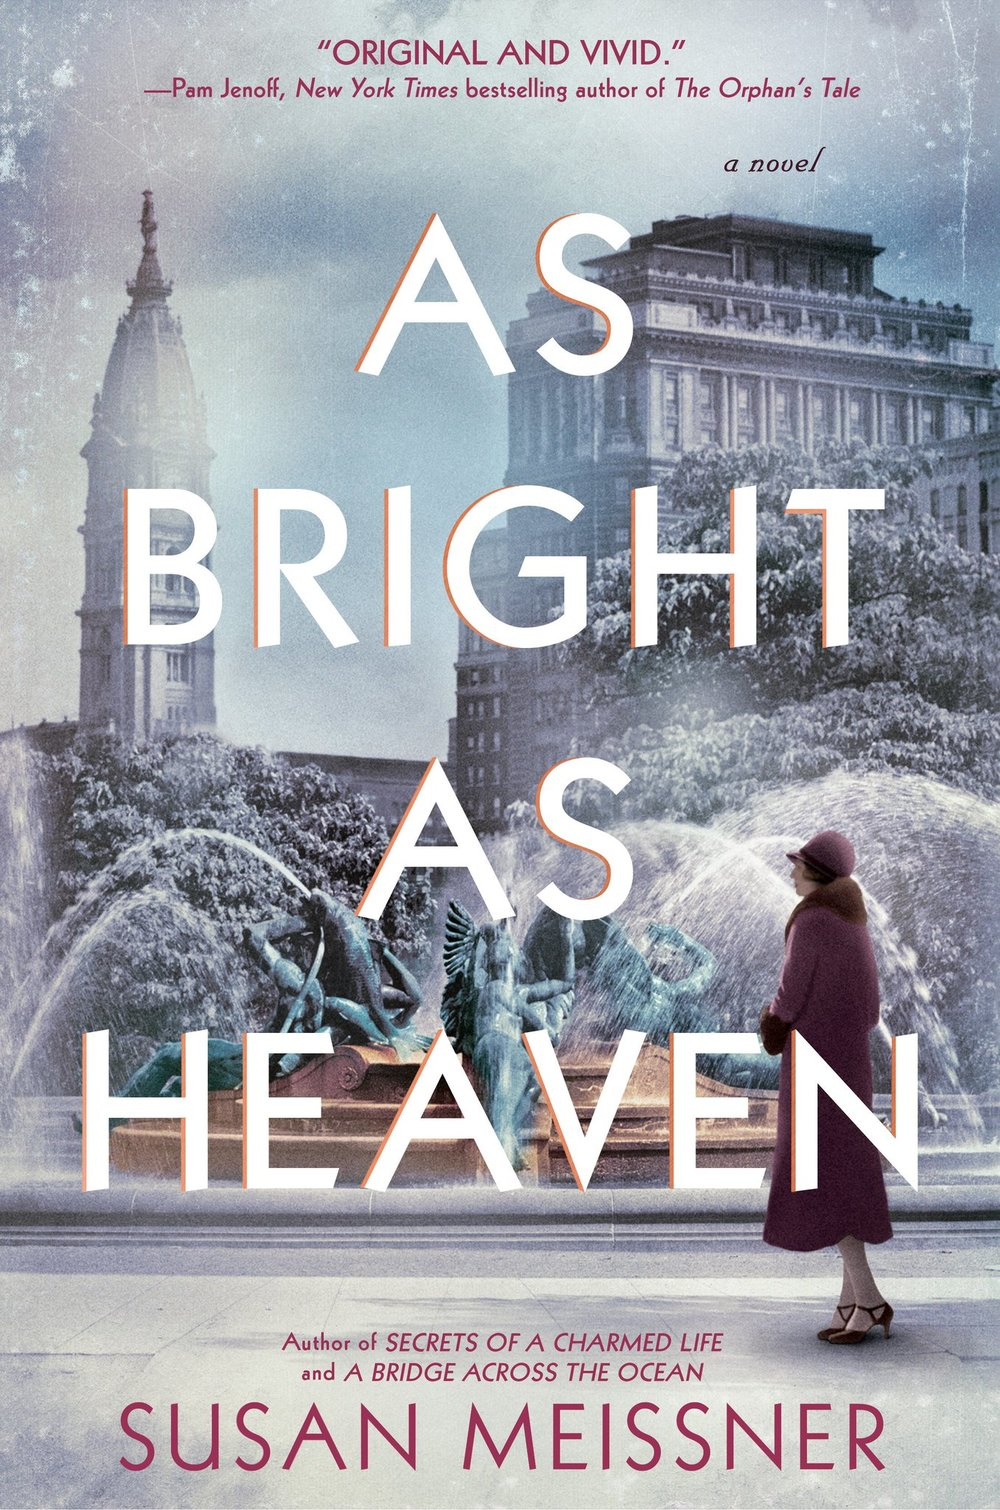 As Bright As Heaven      by Susan Meissner  Berkley --- February 6, 2018